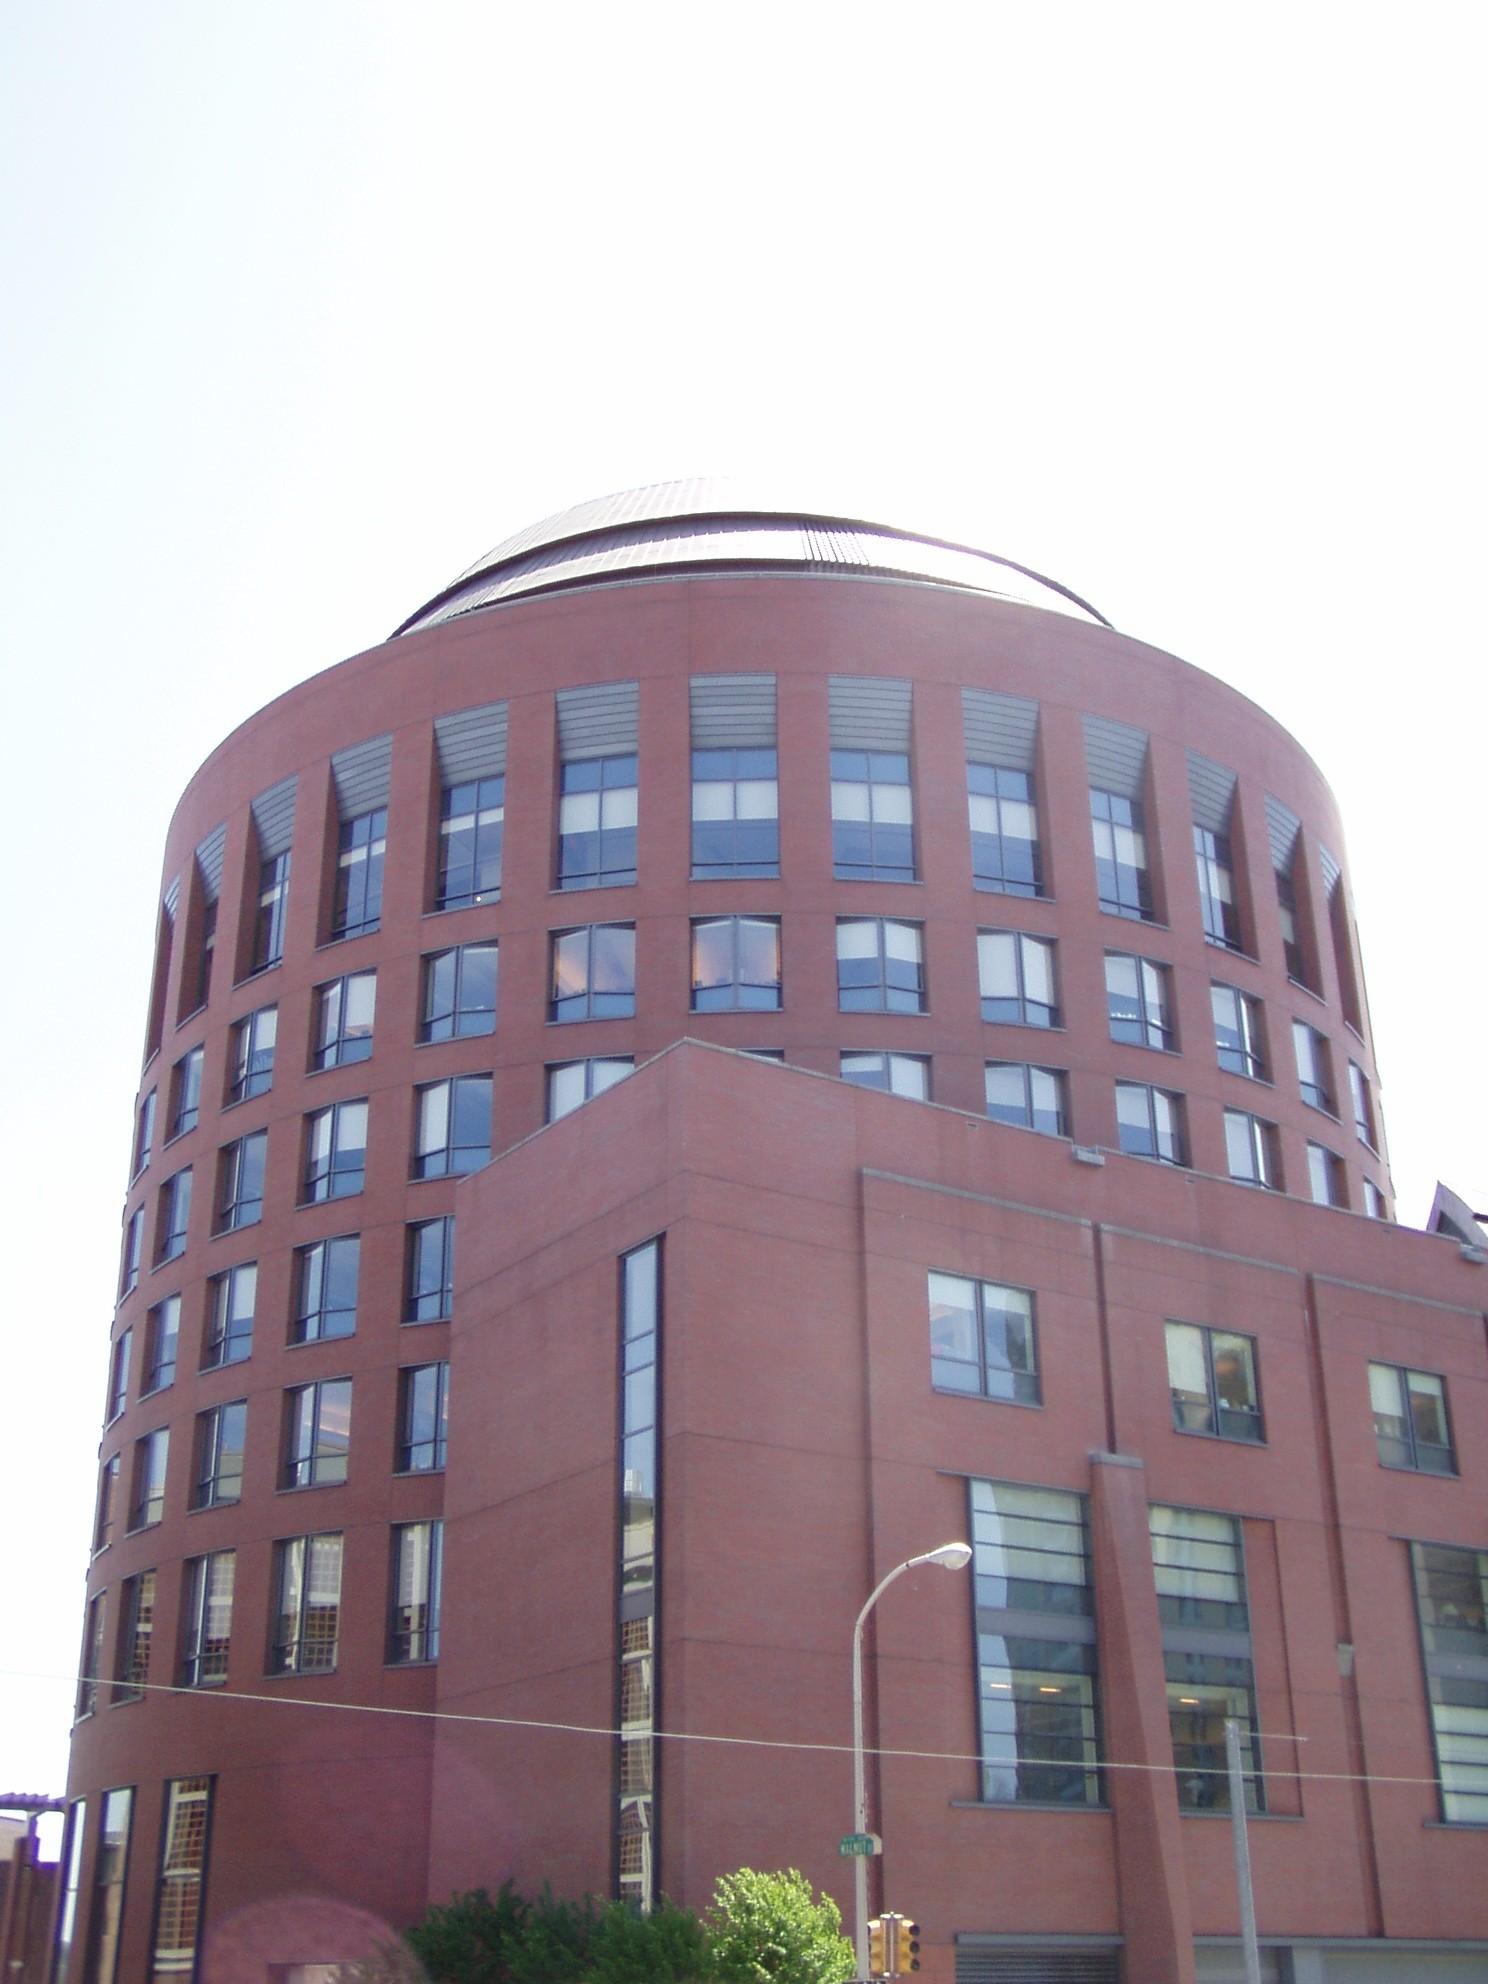 image of The Wharton School